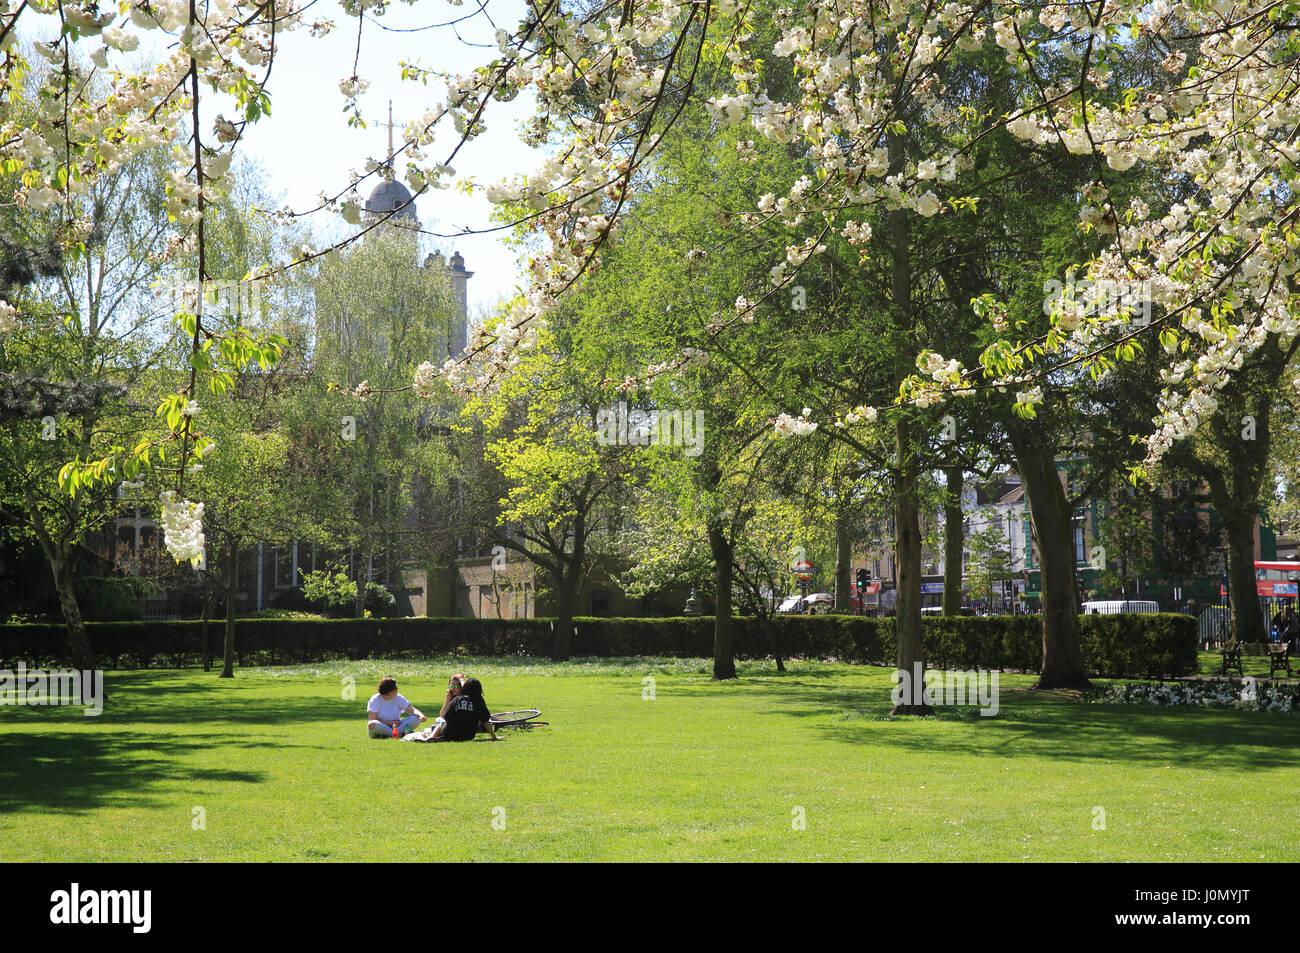 Museum Gardens, Bethnal Green, Tower Hamlets, London - Stock Image